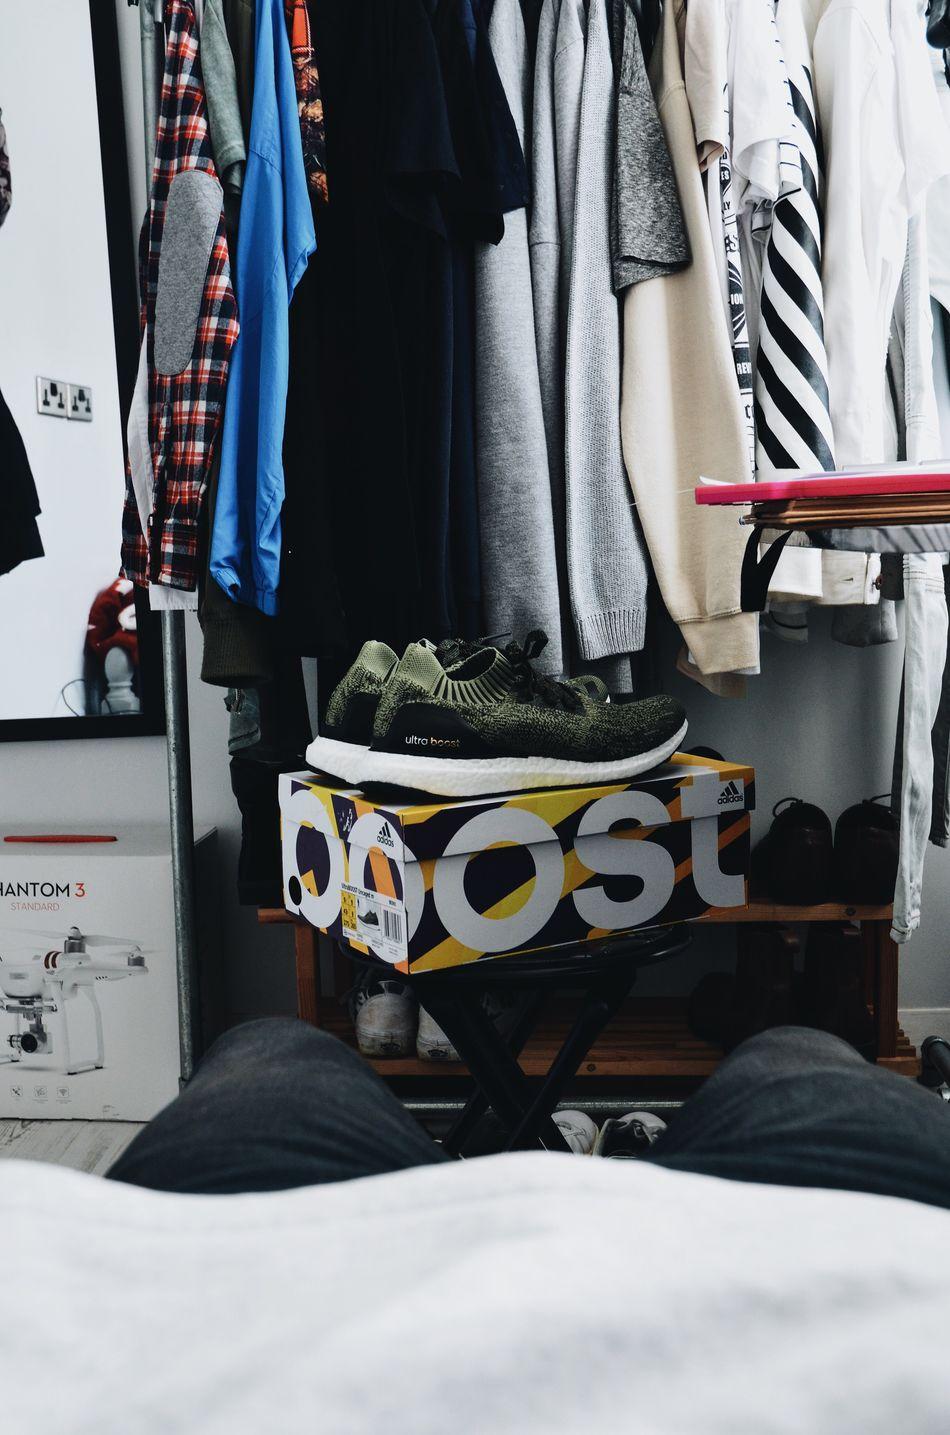 Adidasboost Ultraboost Ultraboostuncaged Boost Adidas Sneakers Sneakerhead  Offwhite Fearofgod Supreme